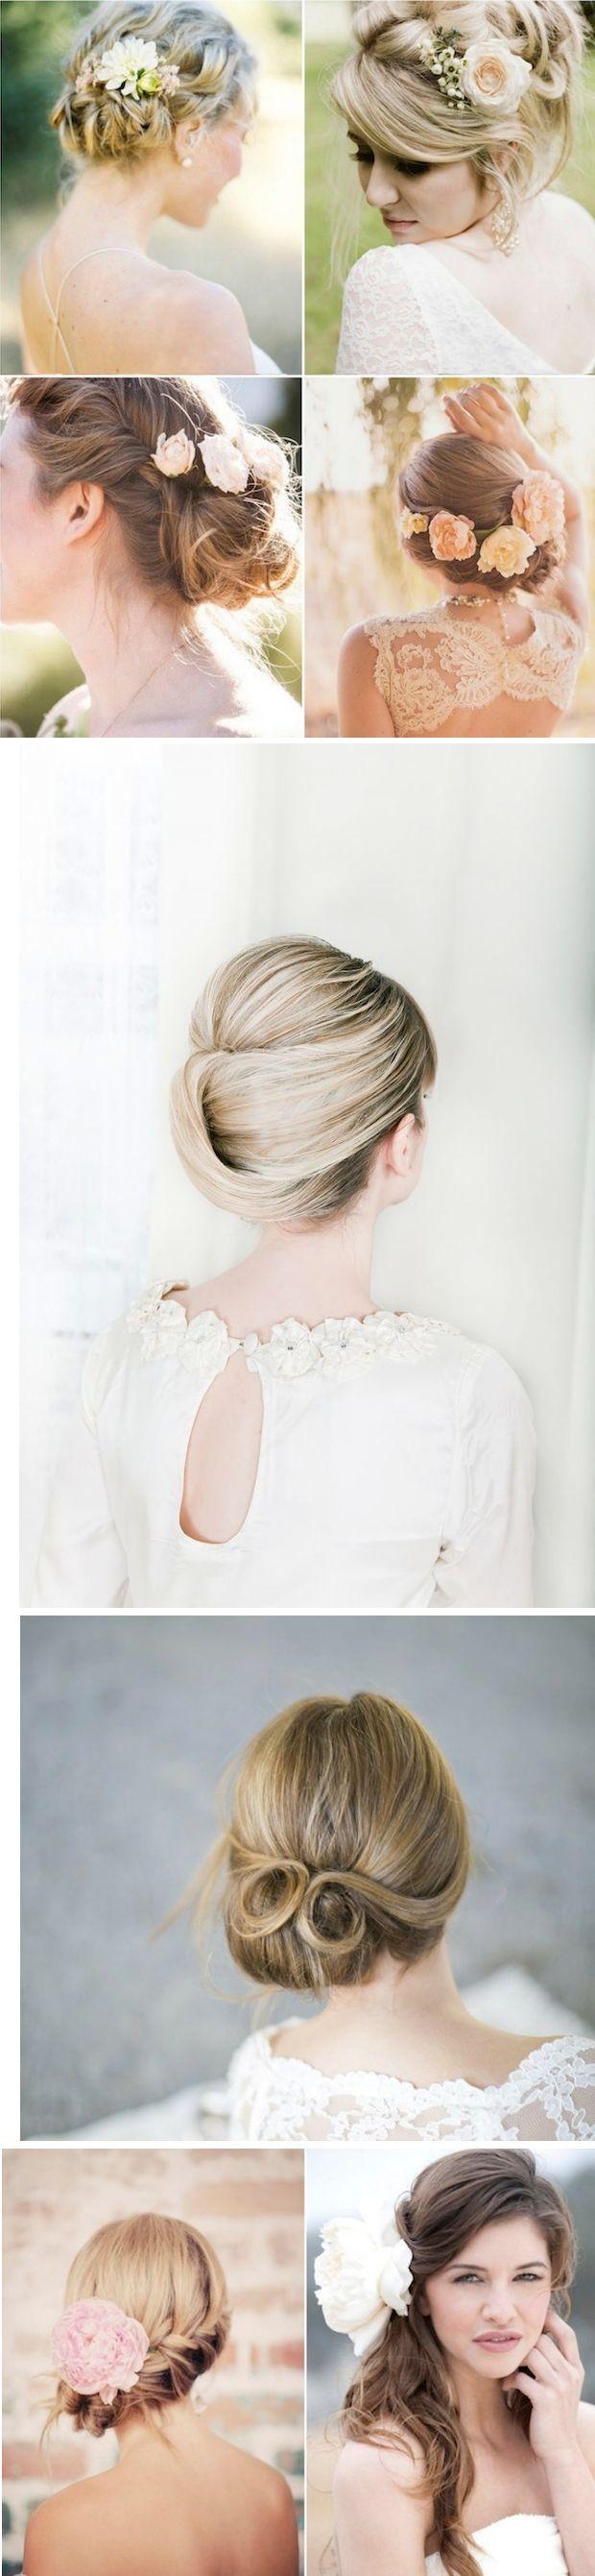 Pin by Erika Kogati on Flores | Pinterest | Party hair, Wedding hair ...